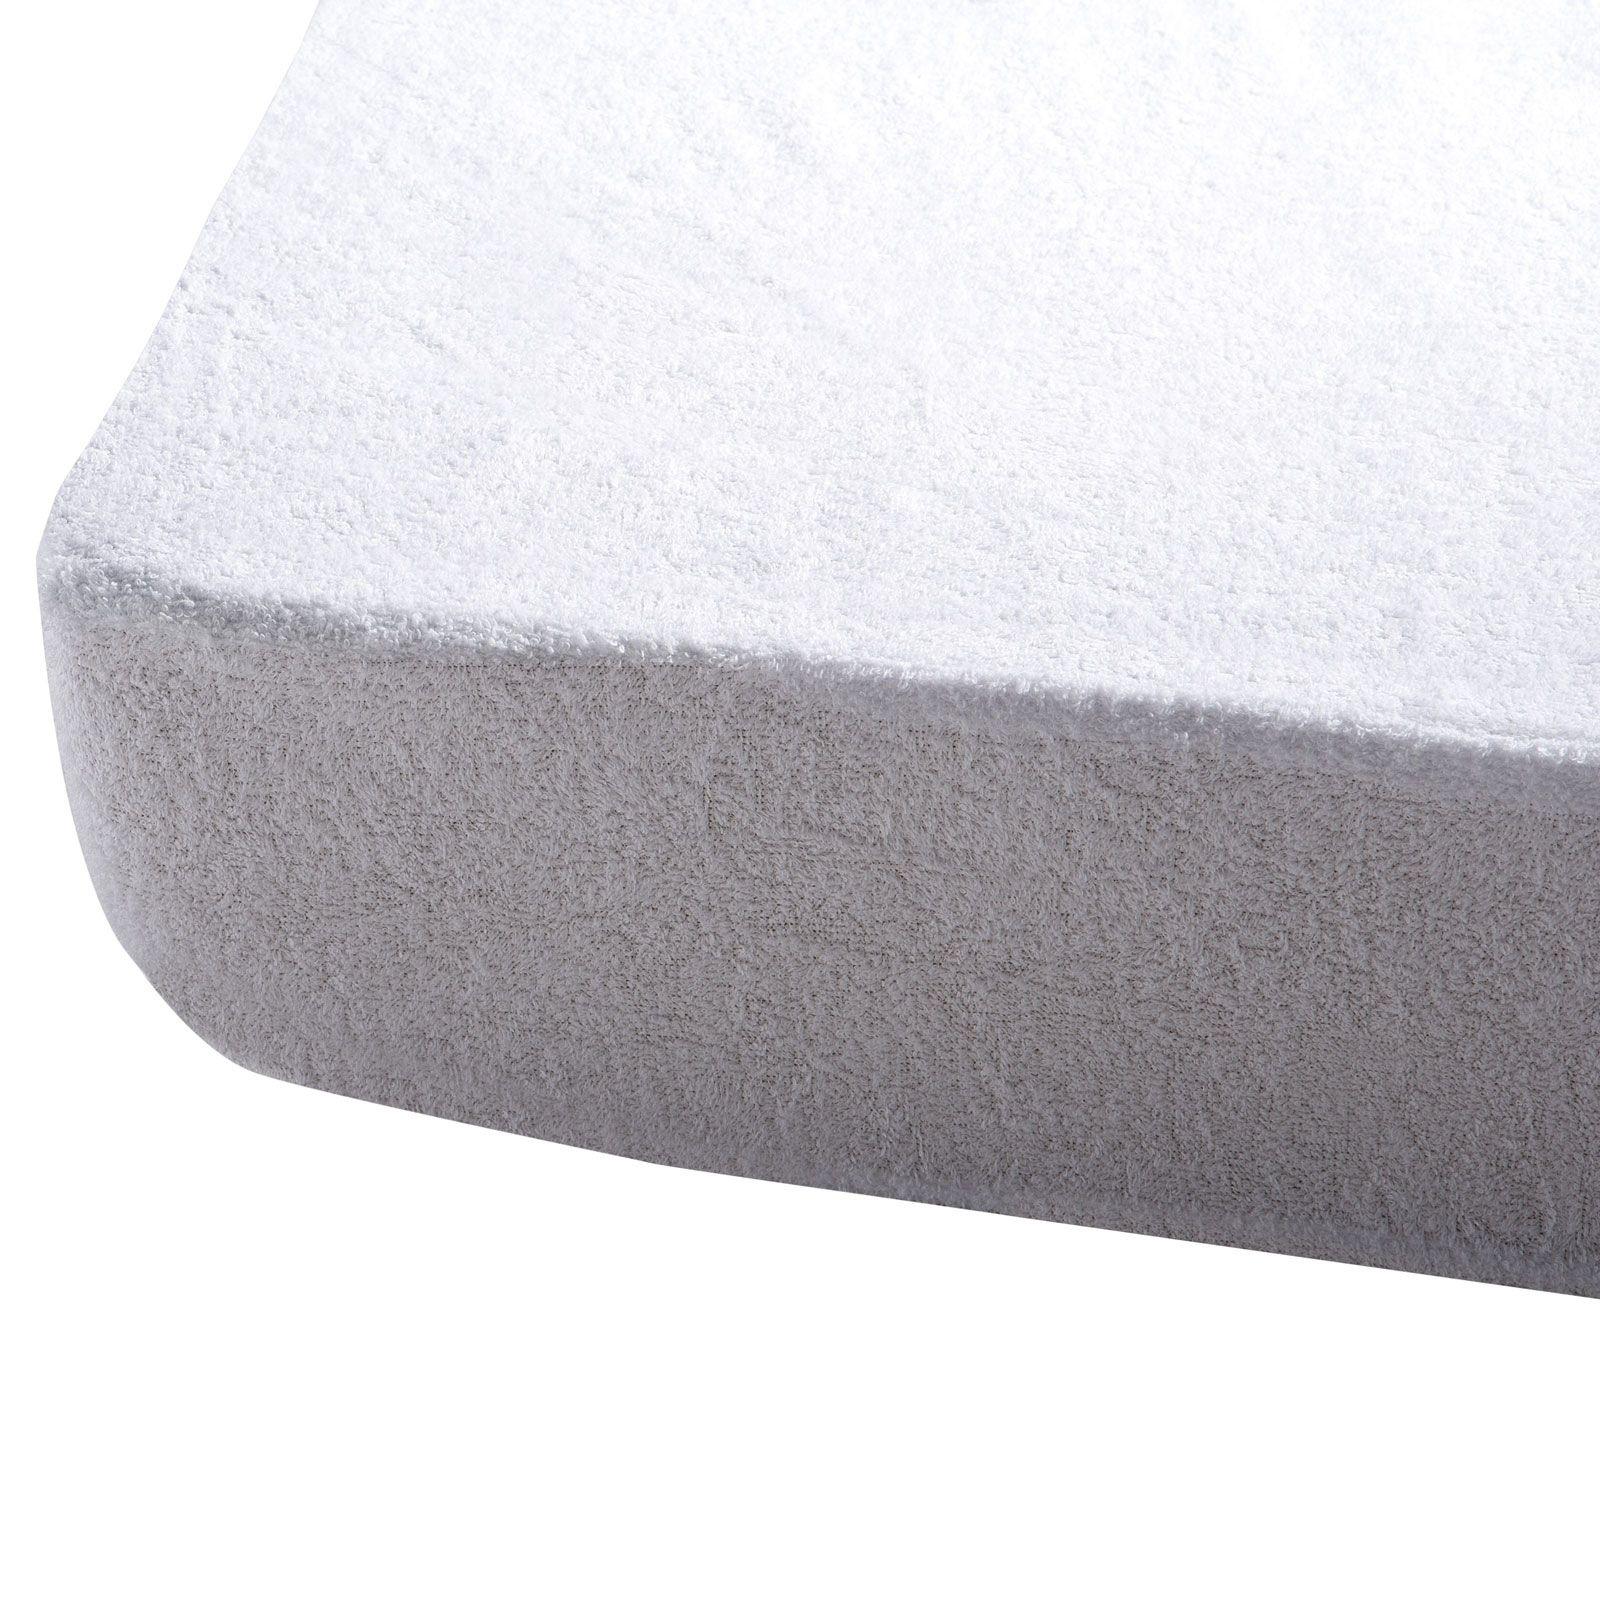 prot ge matelas al se en tissu ponge 55 x 85 cm naf naf al se de berceau berceau. Black Bedroom Furniture Sets. Home Design Ideas